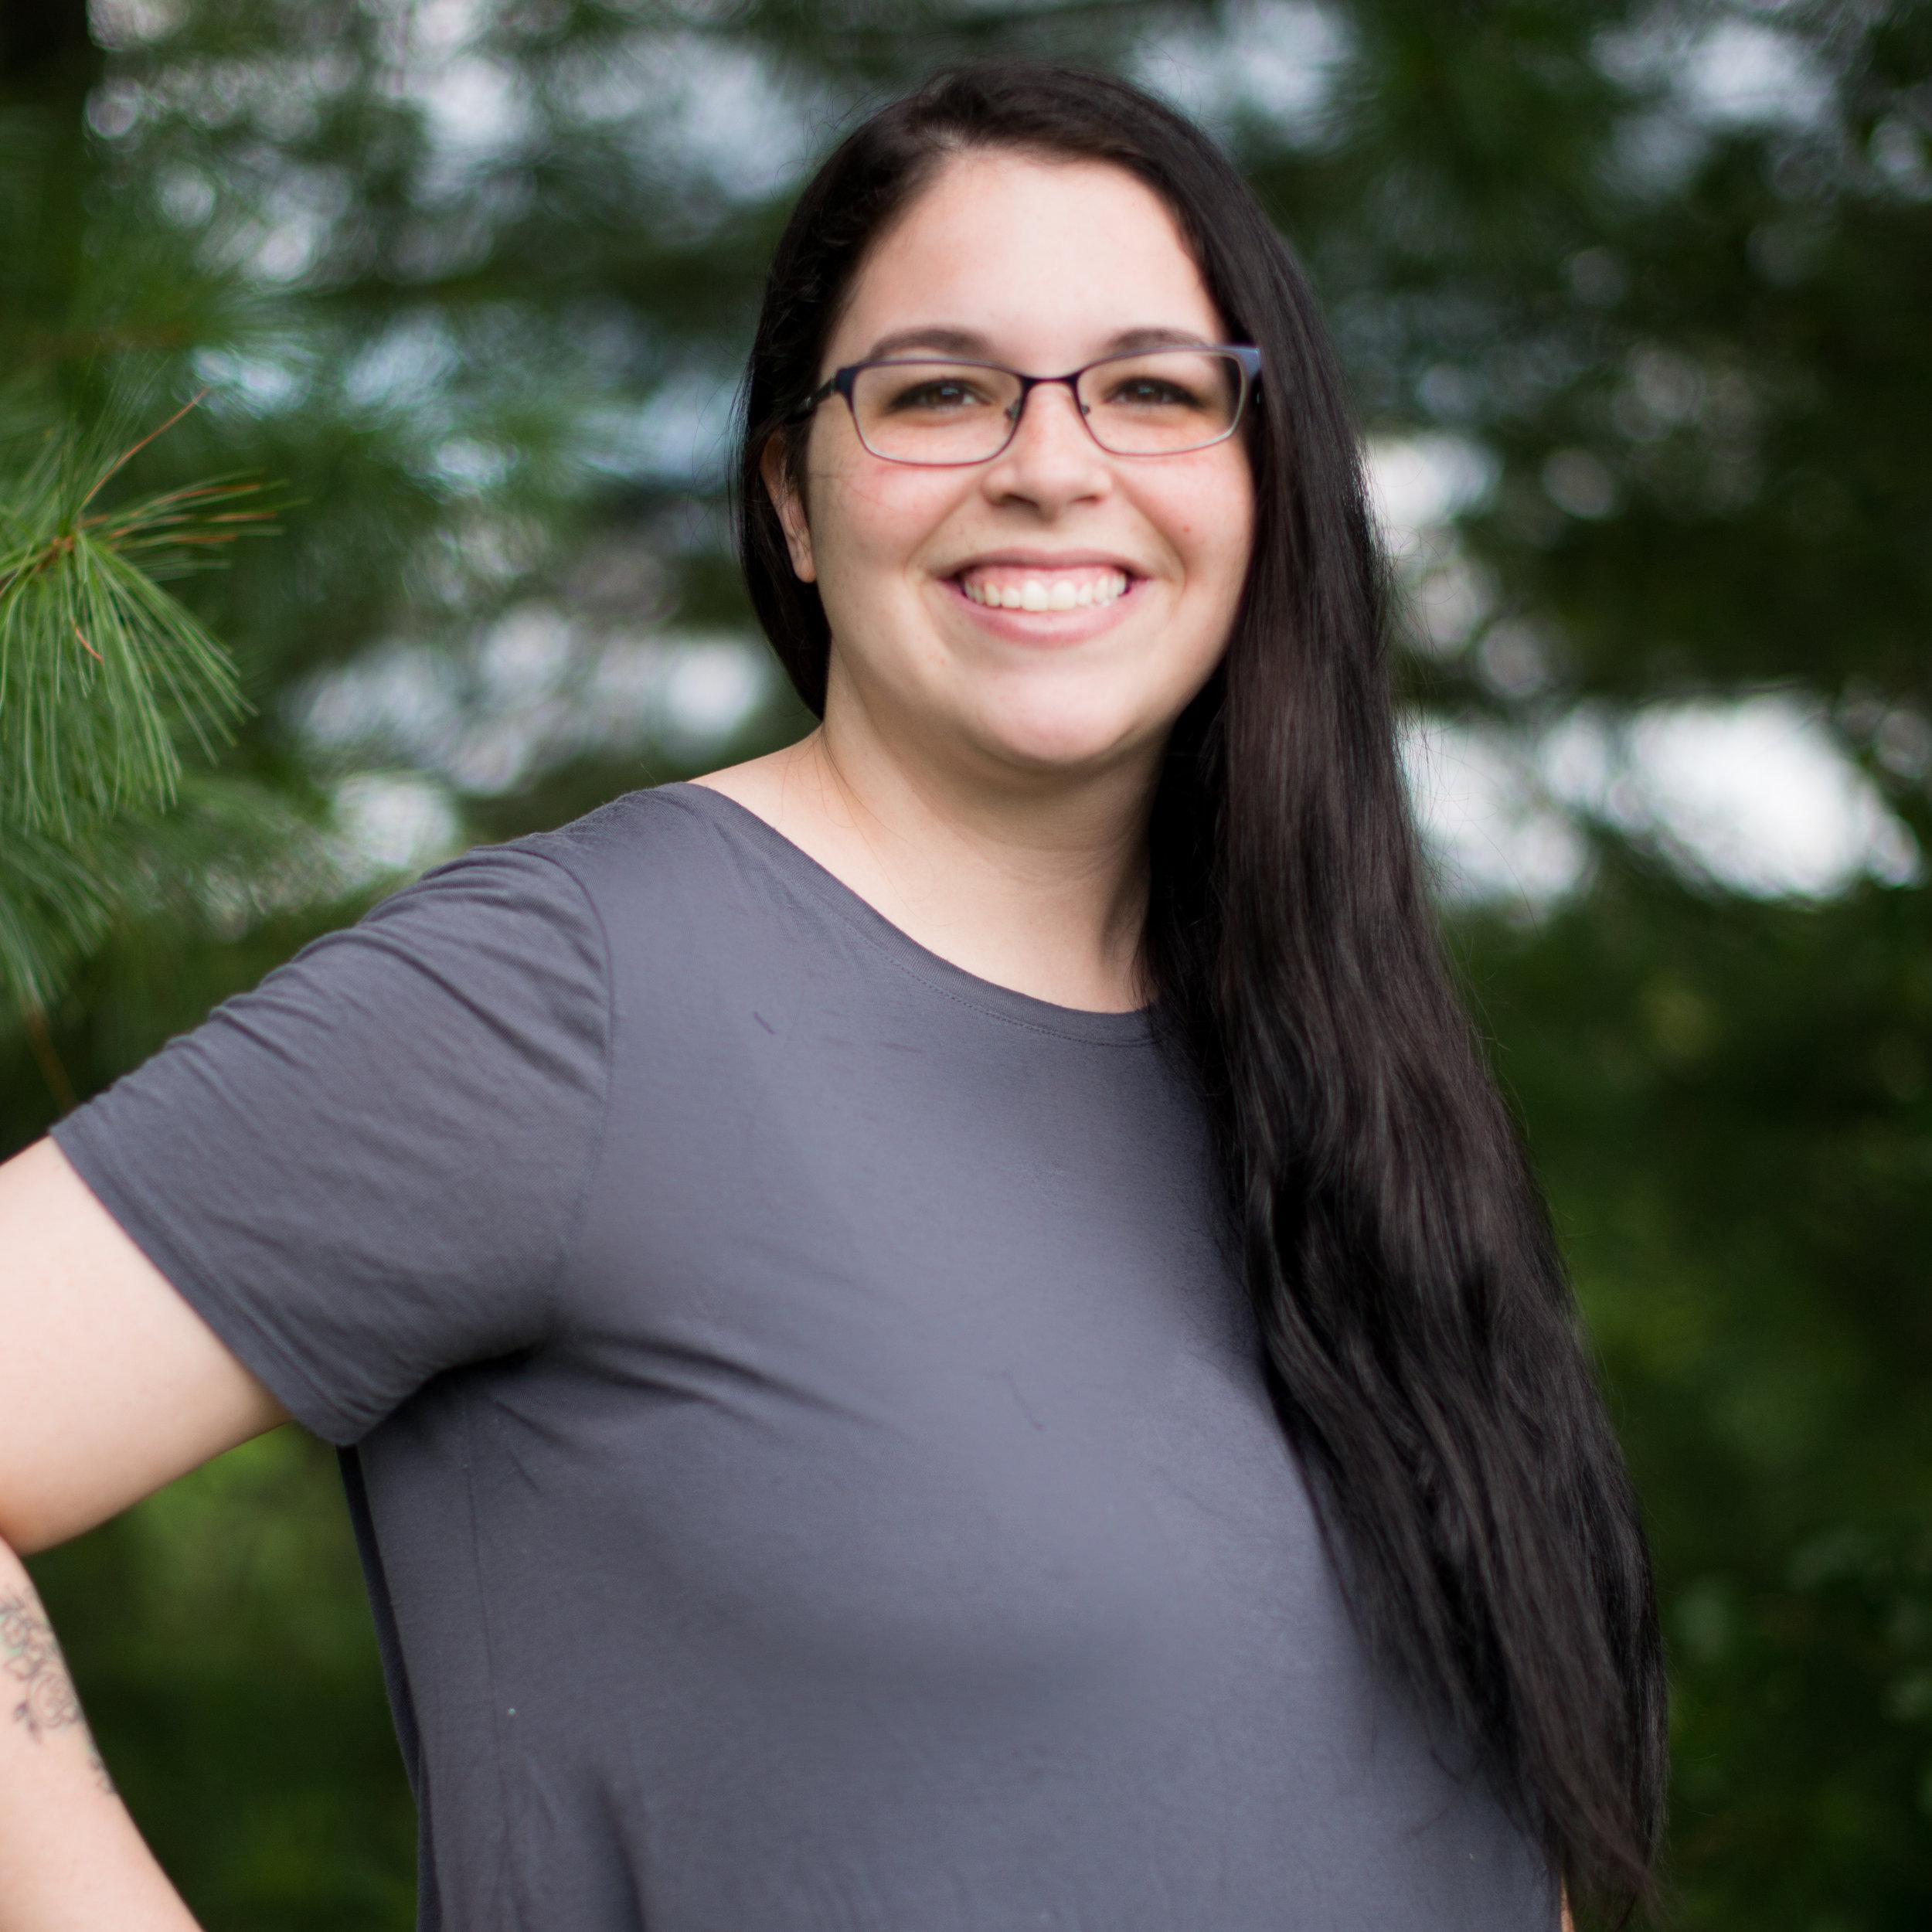 Heather Hanna - Customer Support Lead